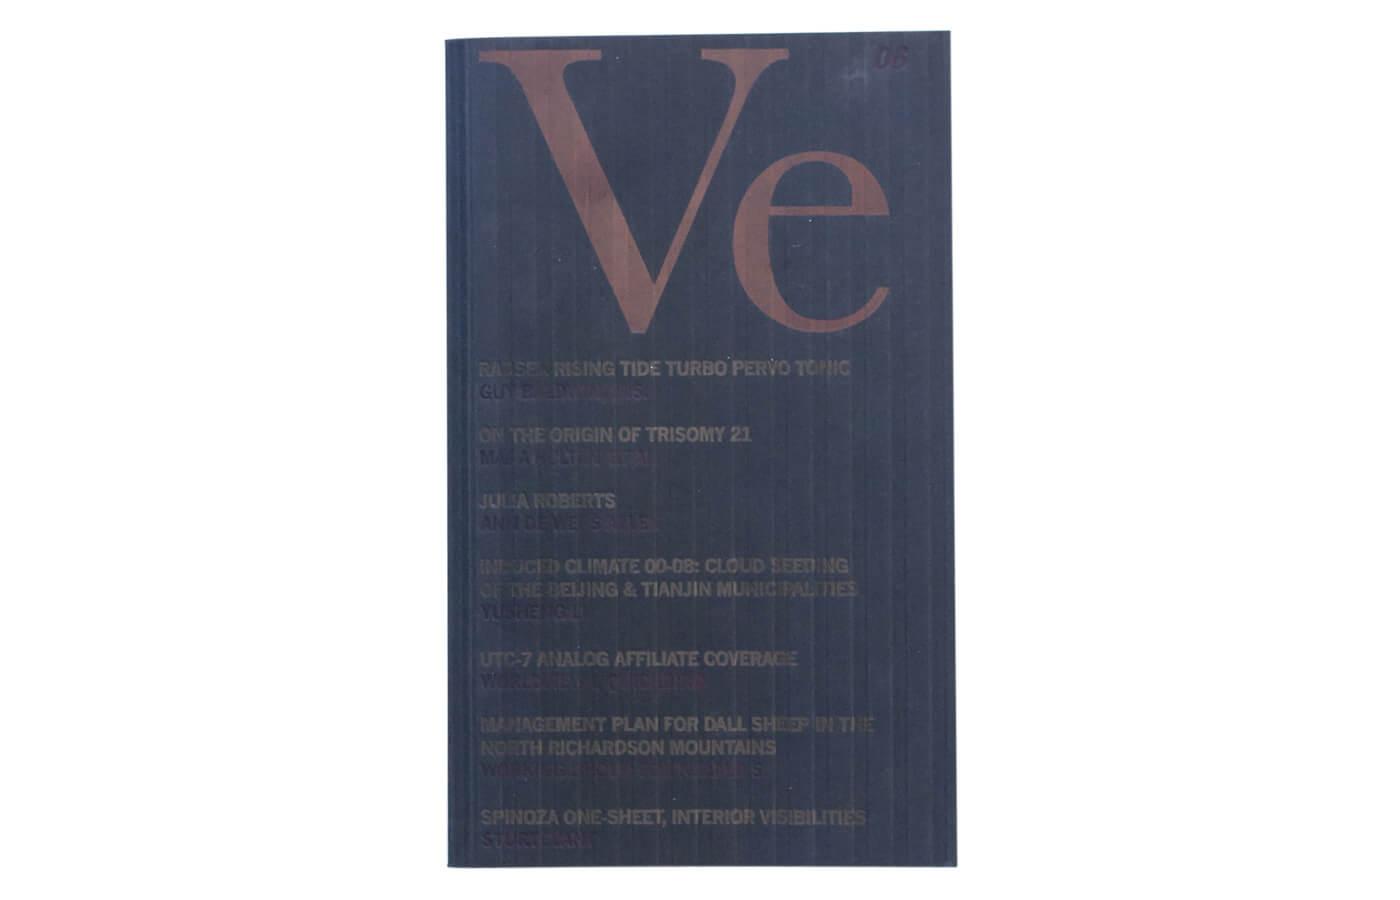 Veneer Magazine #06/18